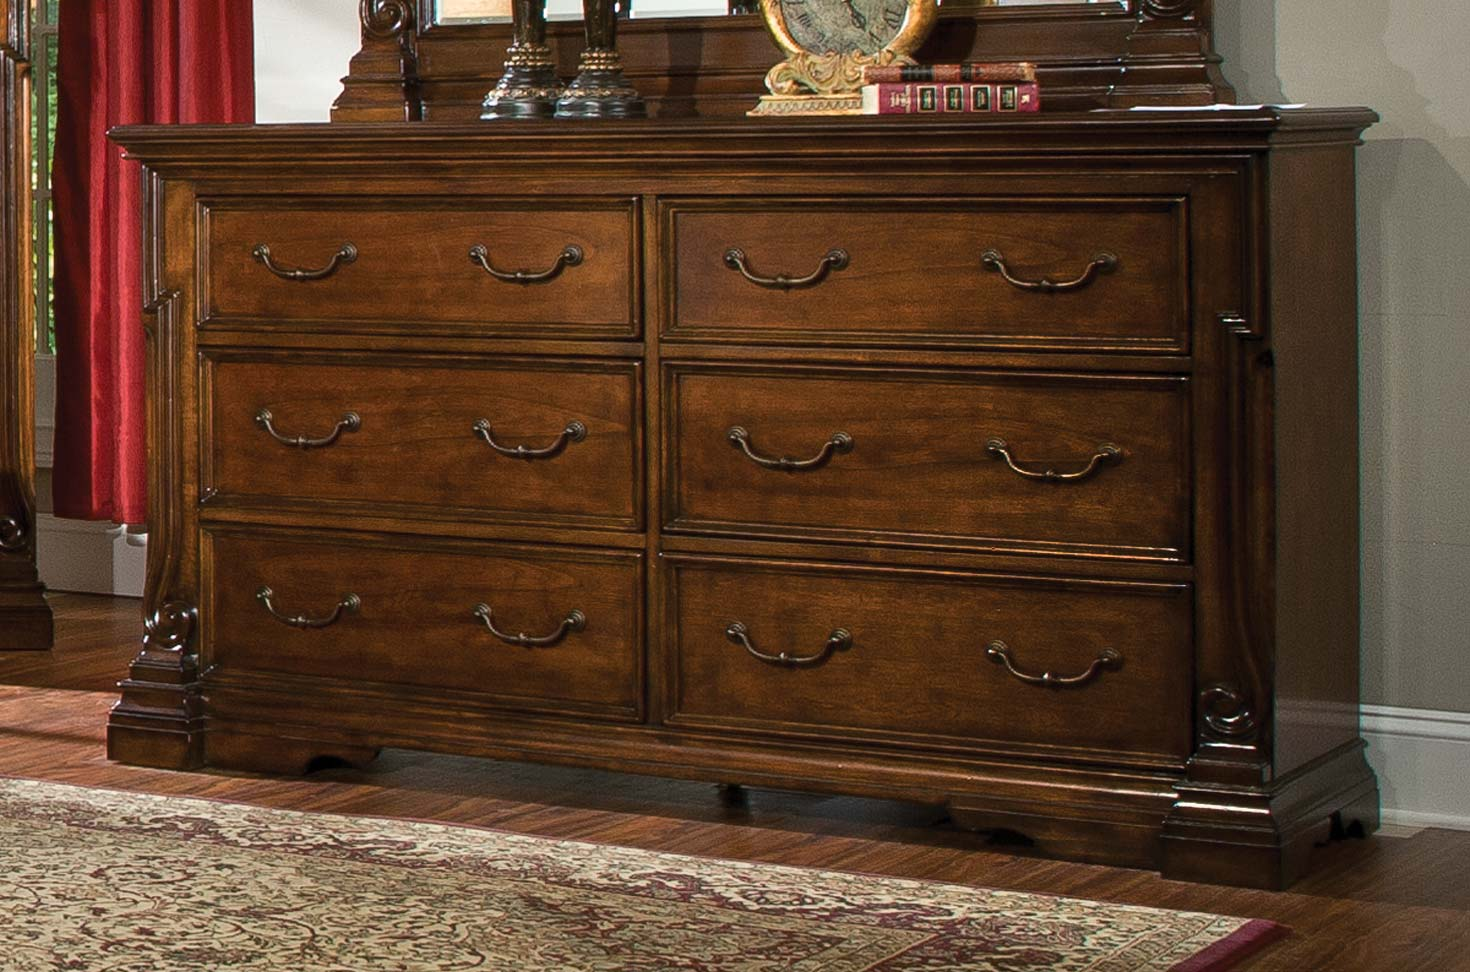 Homelegance Havenwood Dresser - Cherry